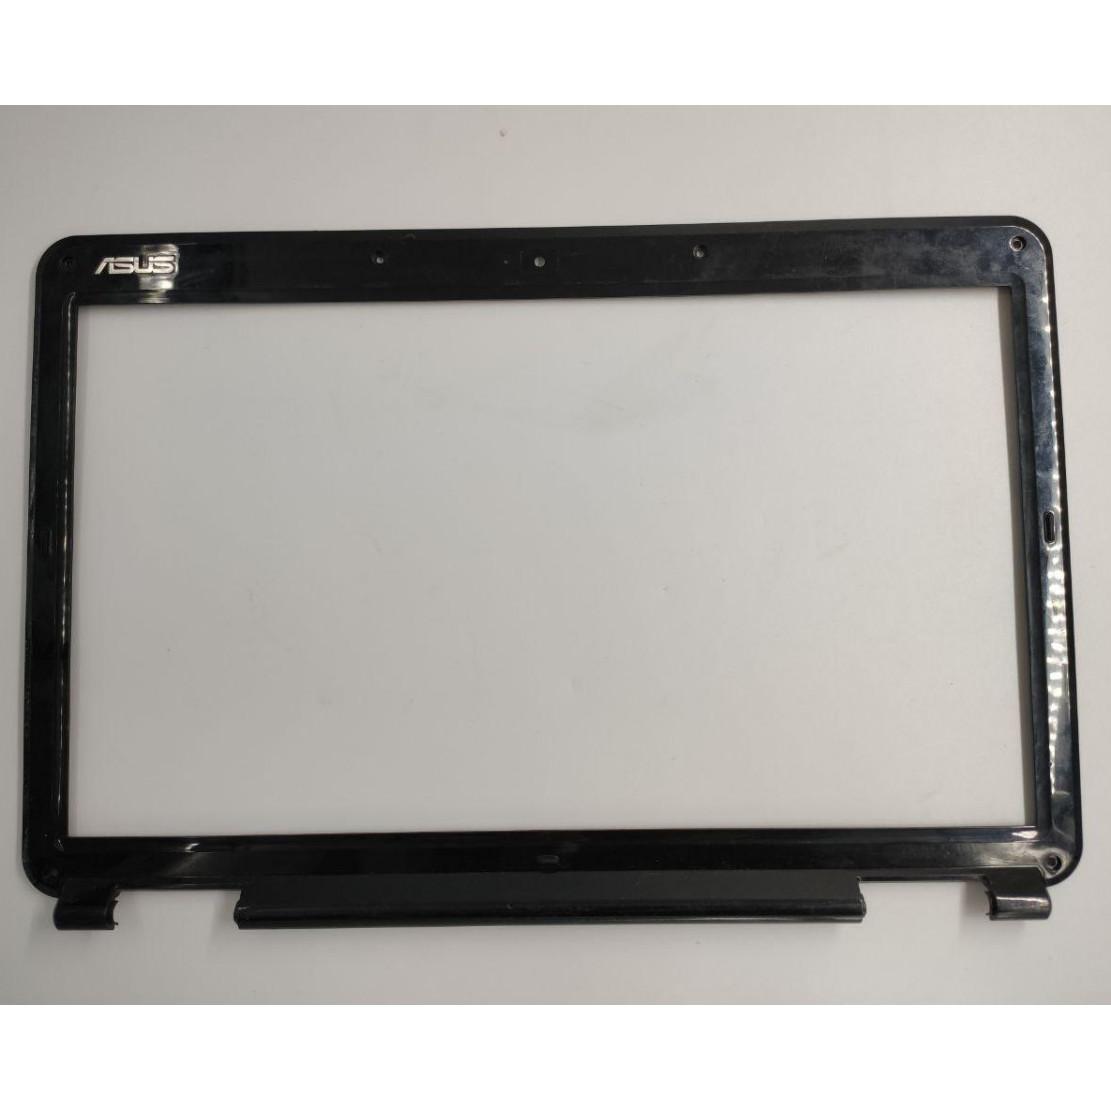 "Рамка матриці для ноутбука Asus X5DIP, 15.6"", 13n0-eja0801, 13gnvk10p021-5, б/в. В хорошому стані, без"